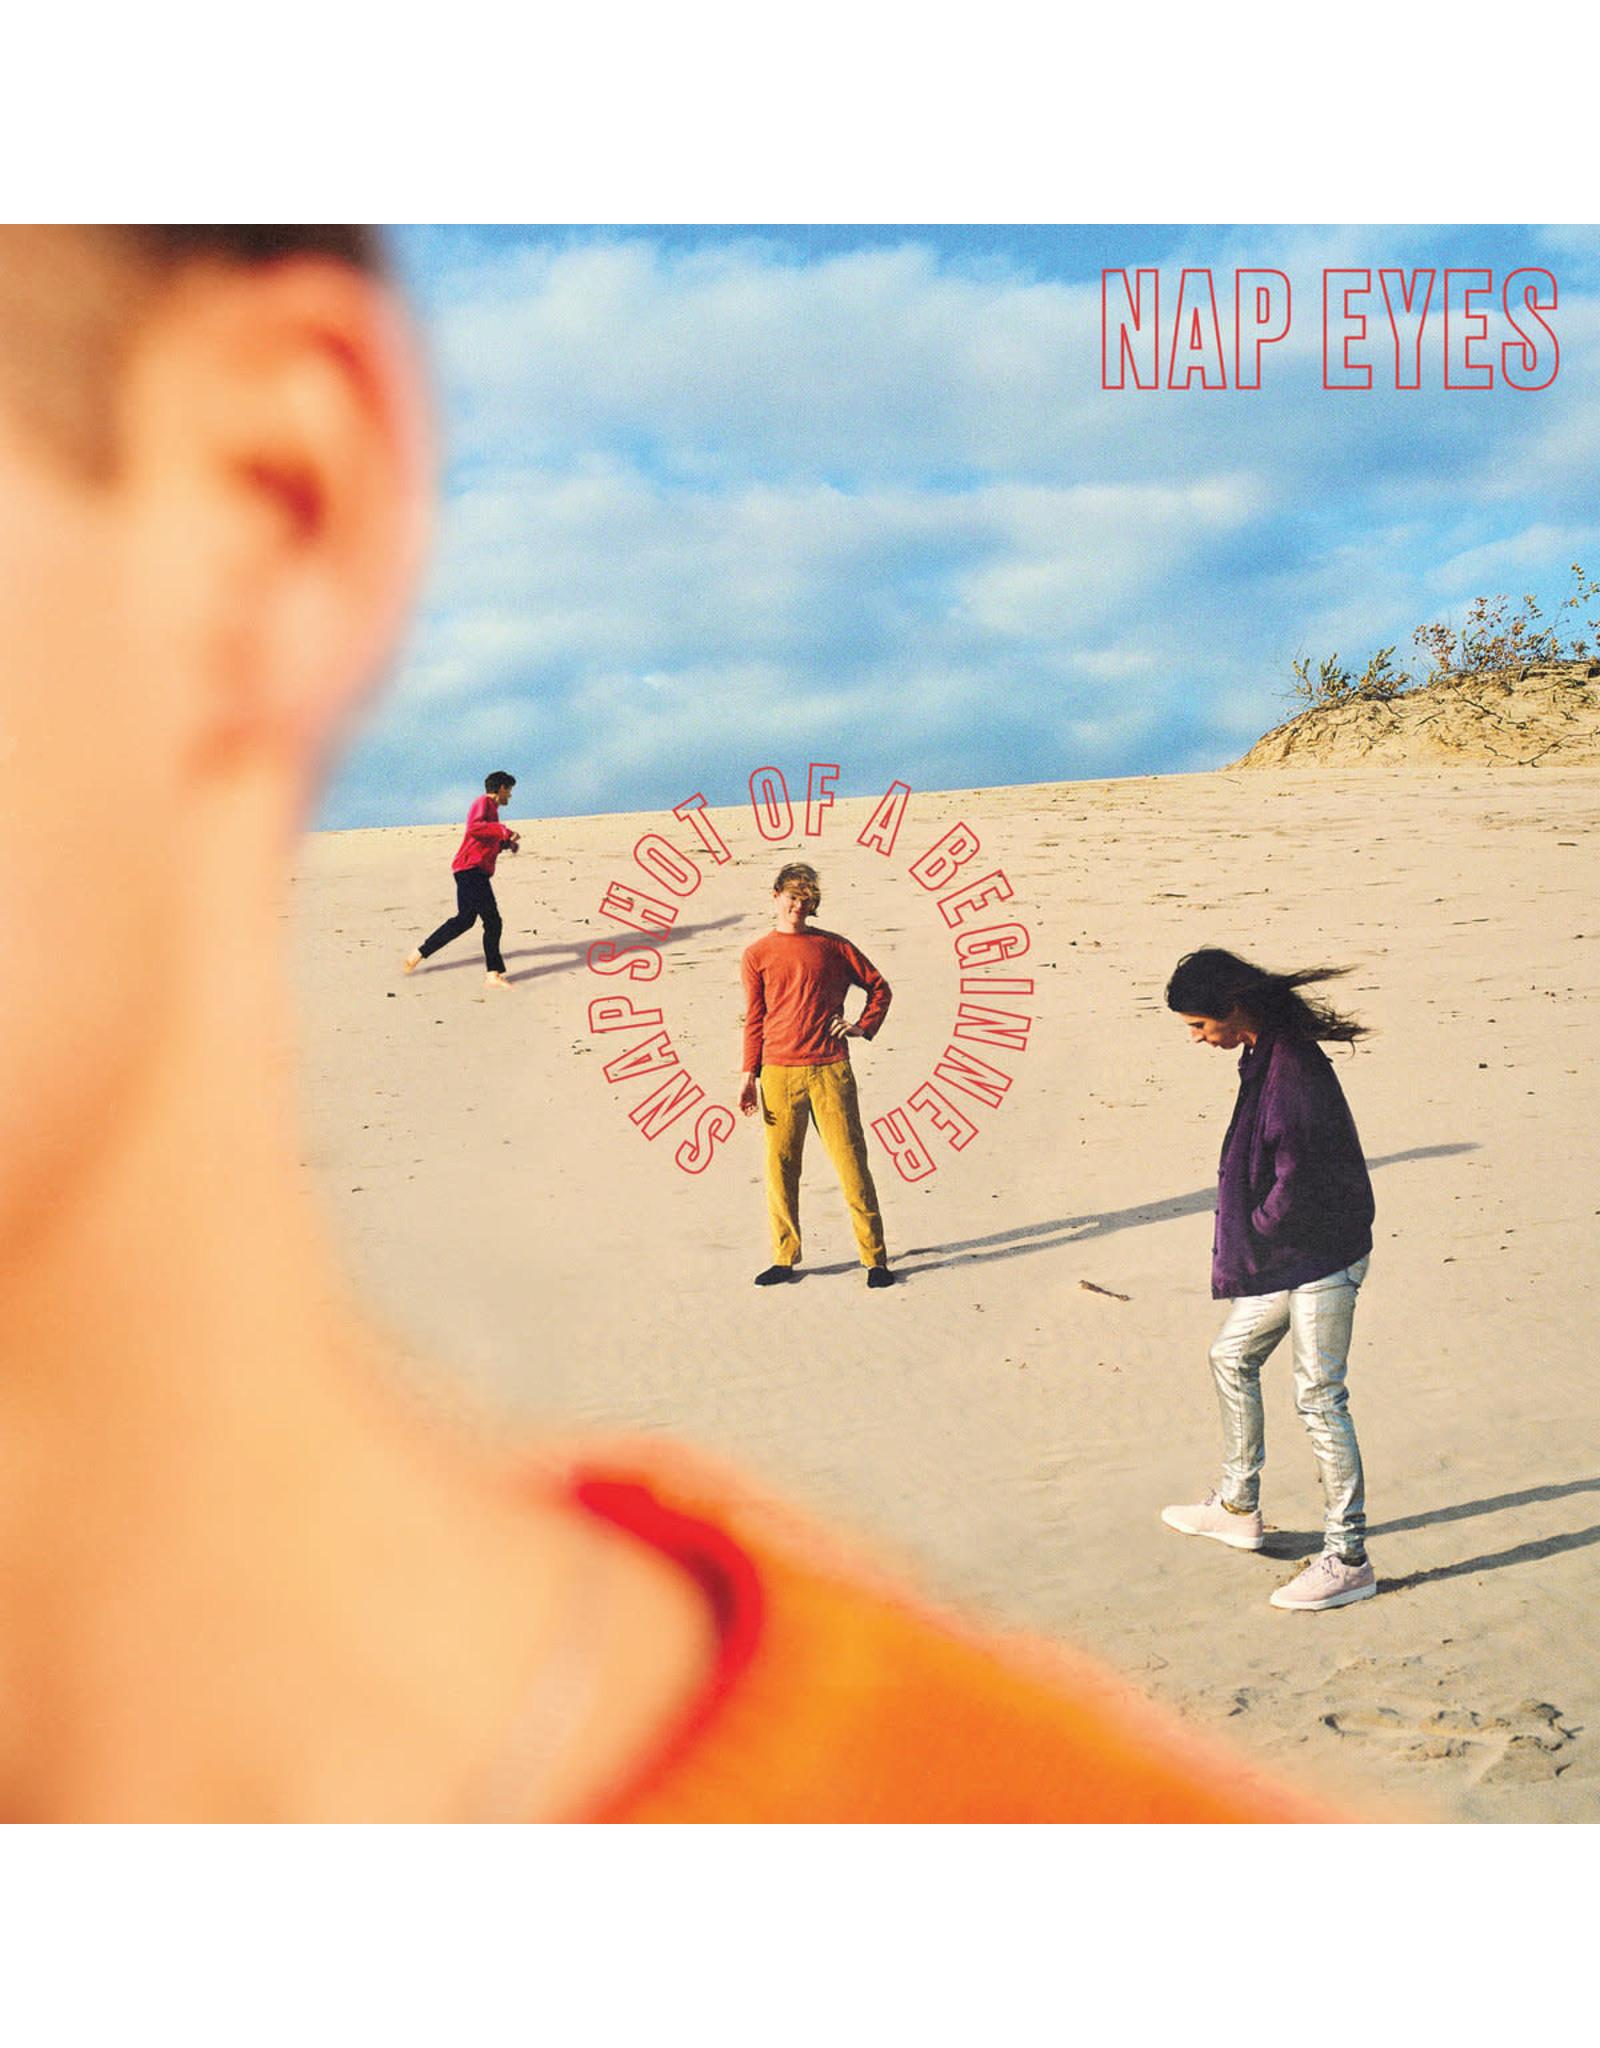 Nap Eyes - Snapshot of a Beginner LP